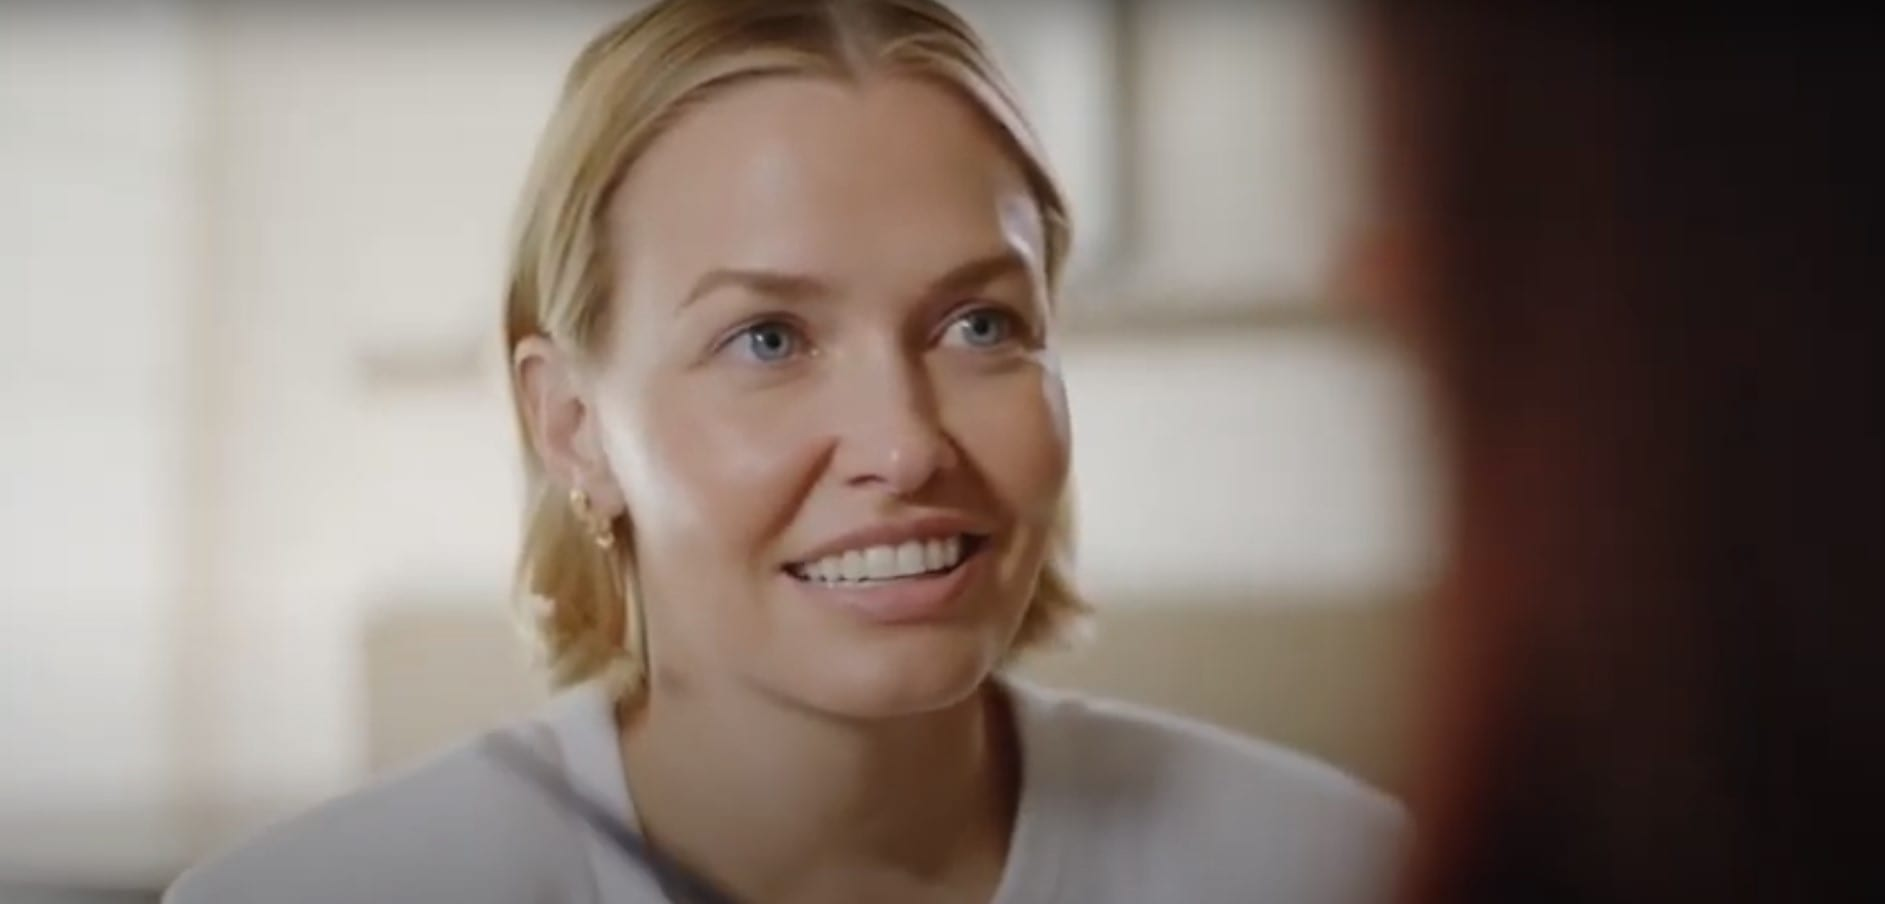 Who is Lara Worthington dating in 2021?